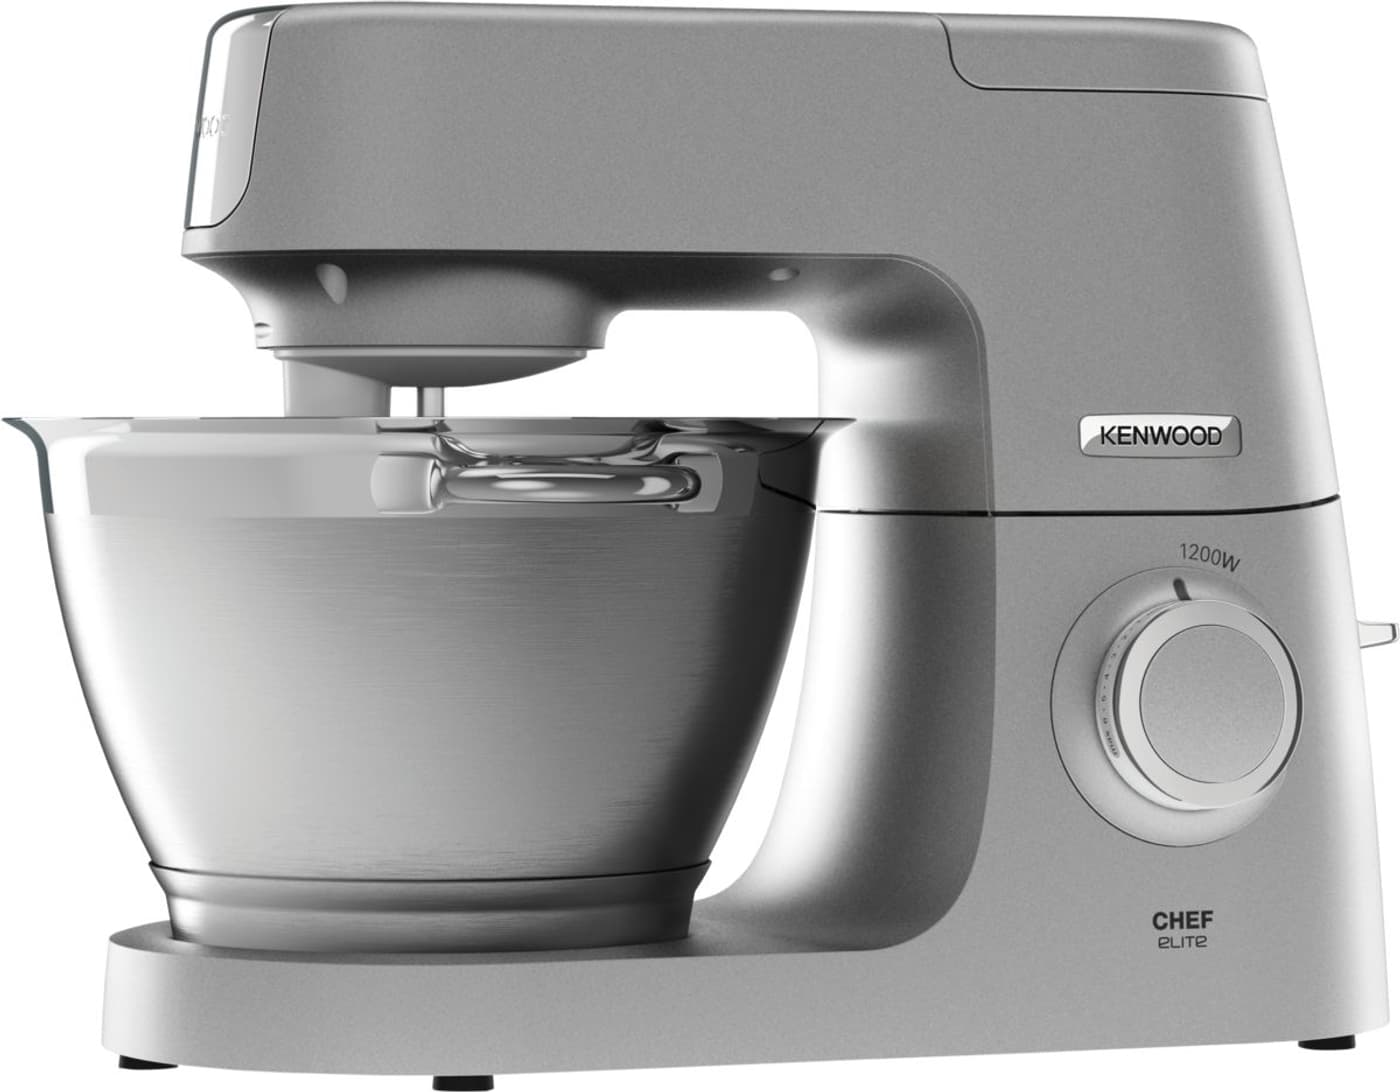 Kenwood Chef Elite KVC5300 Set con AT340 & AT312 Robot da cucina ...